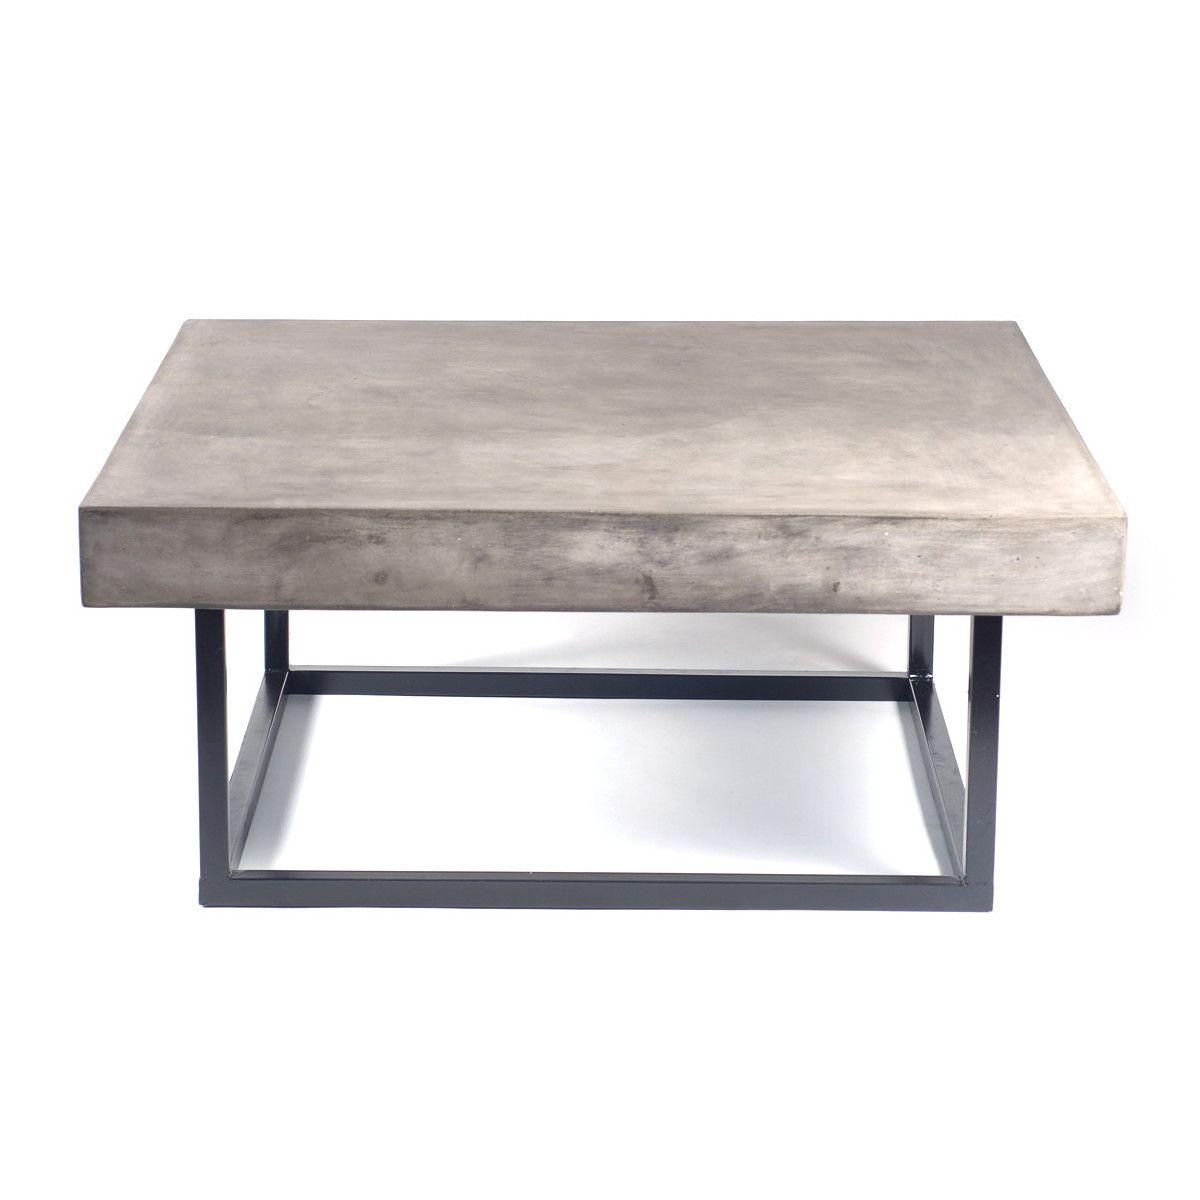 Home Coffee Tables Mia Concrete Indoor Outdoor Table